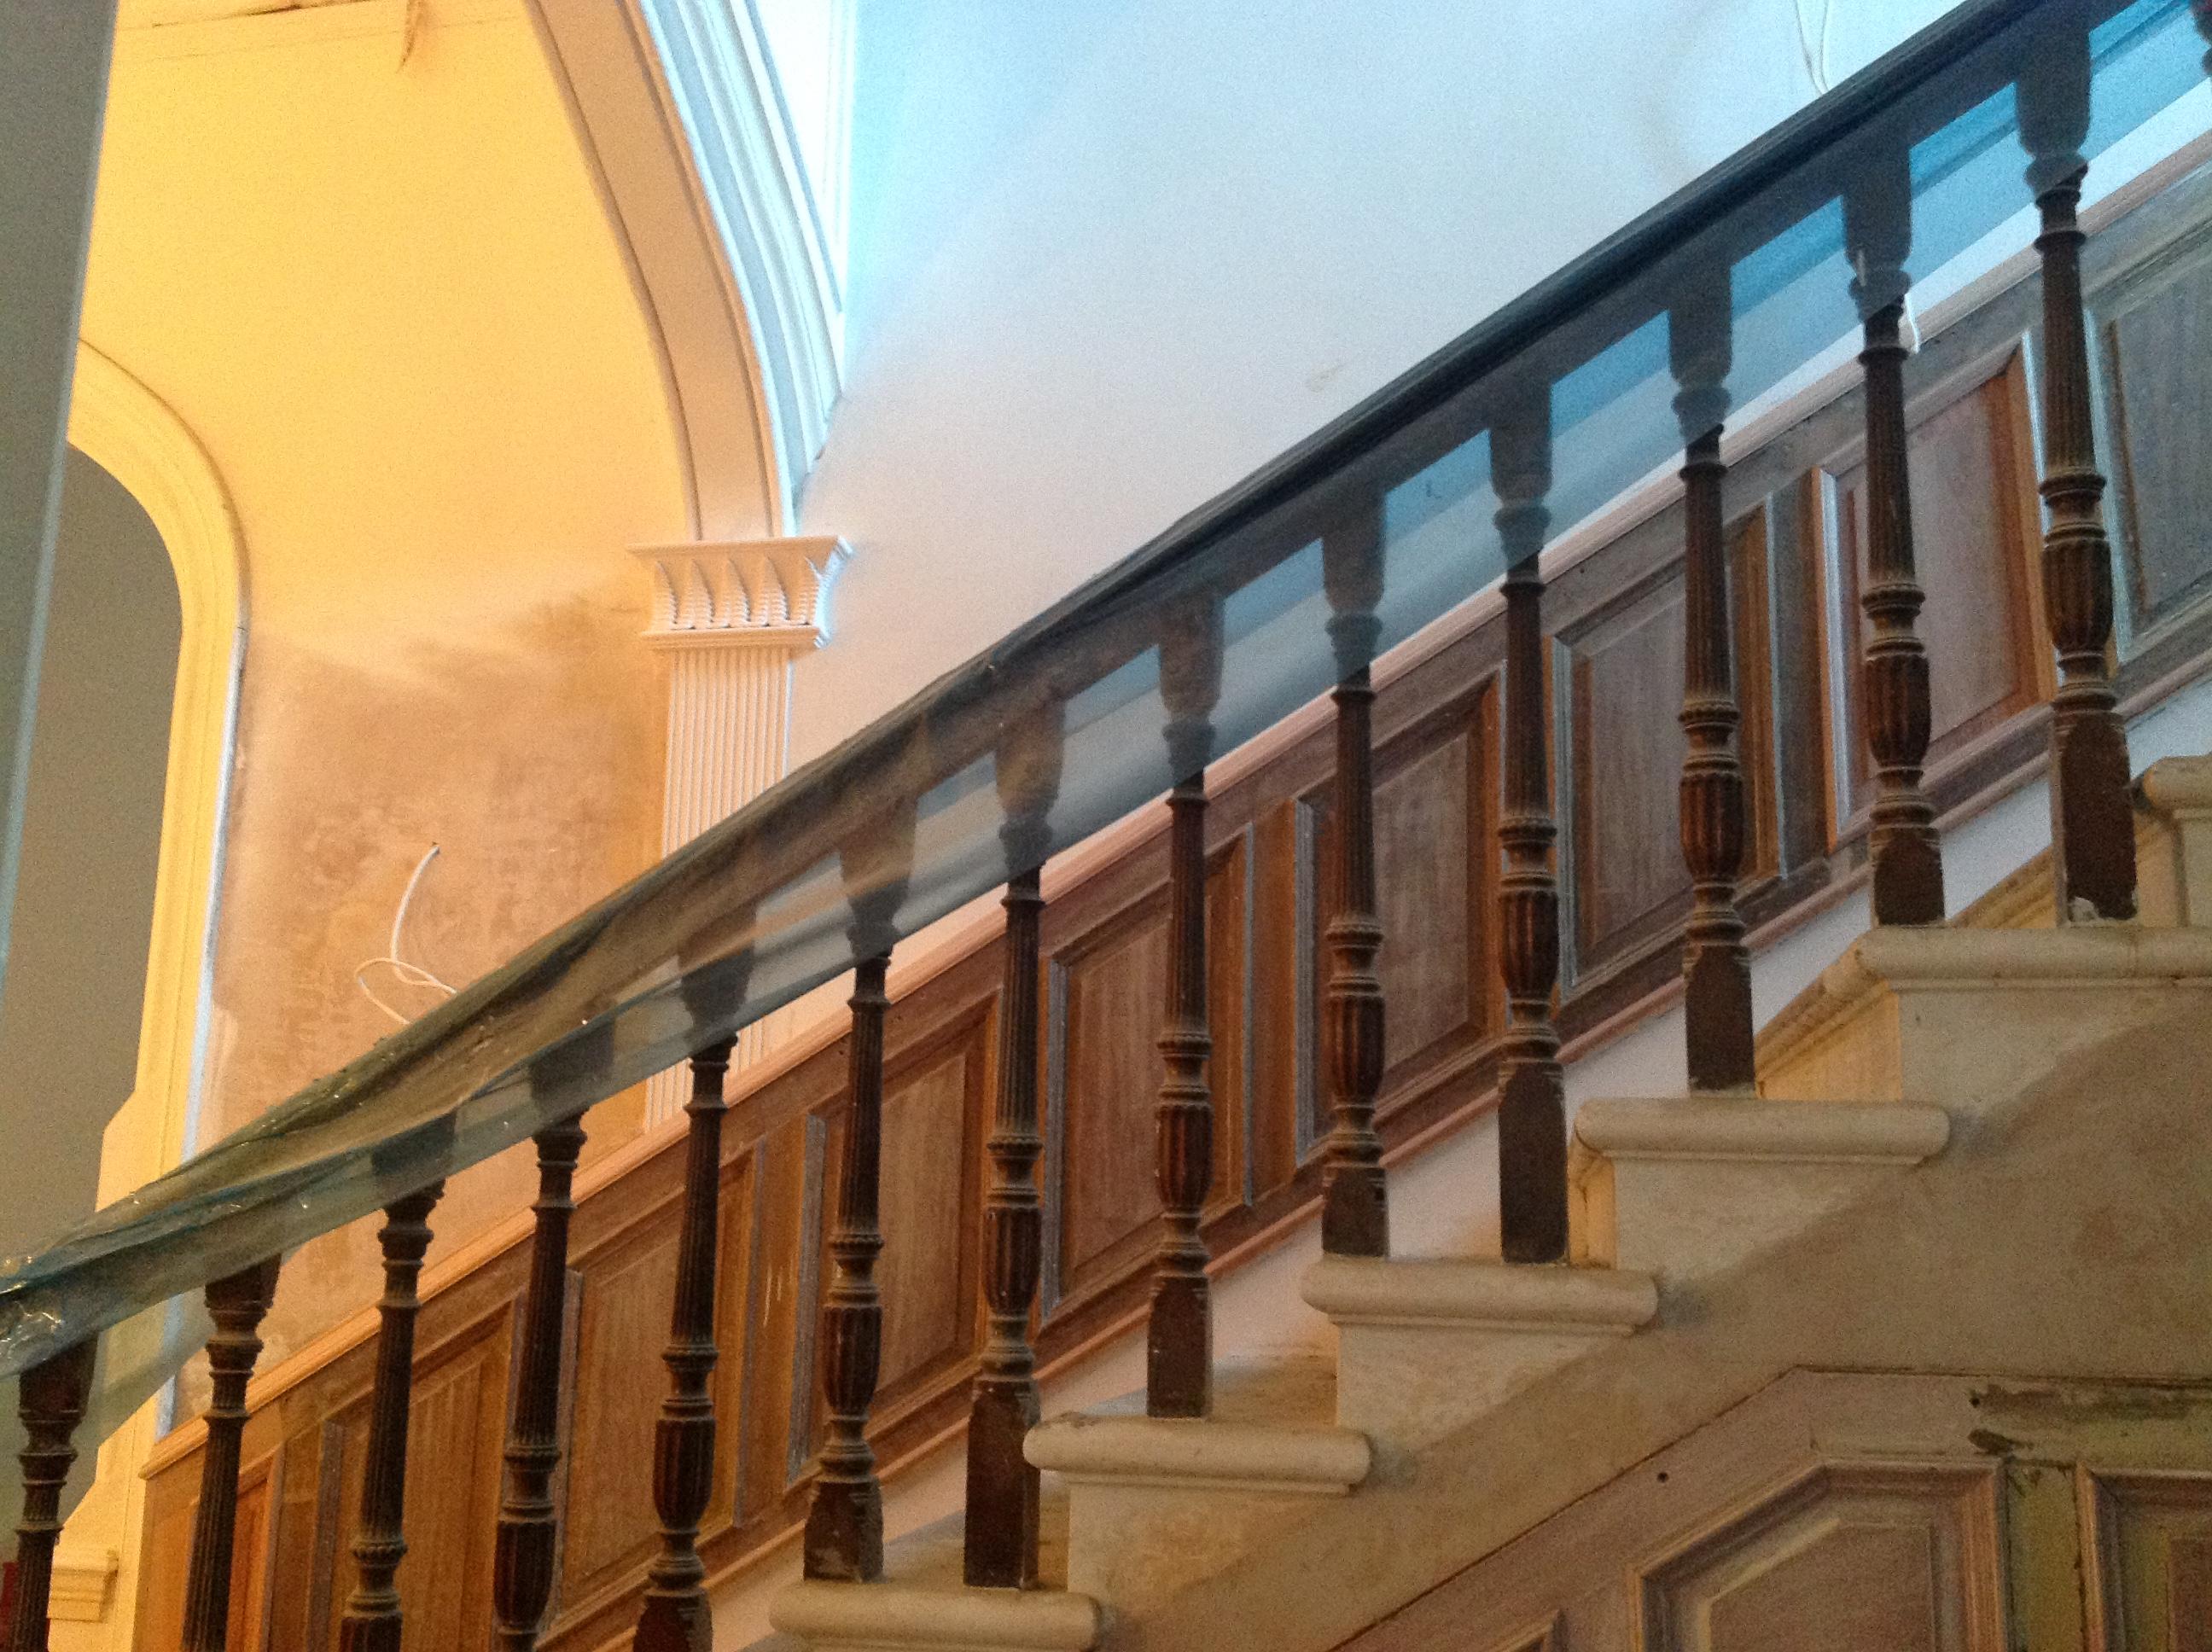 2014 Crossbasket Castle stairway undergoing renovation